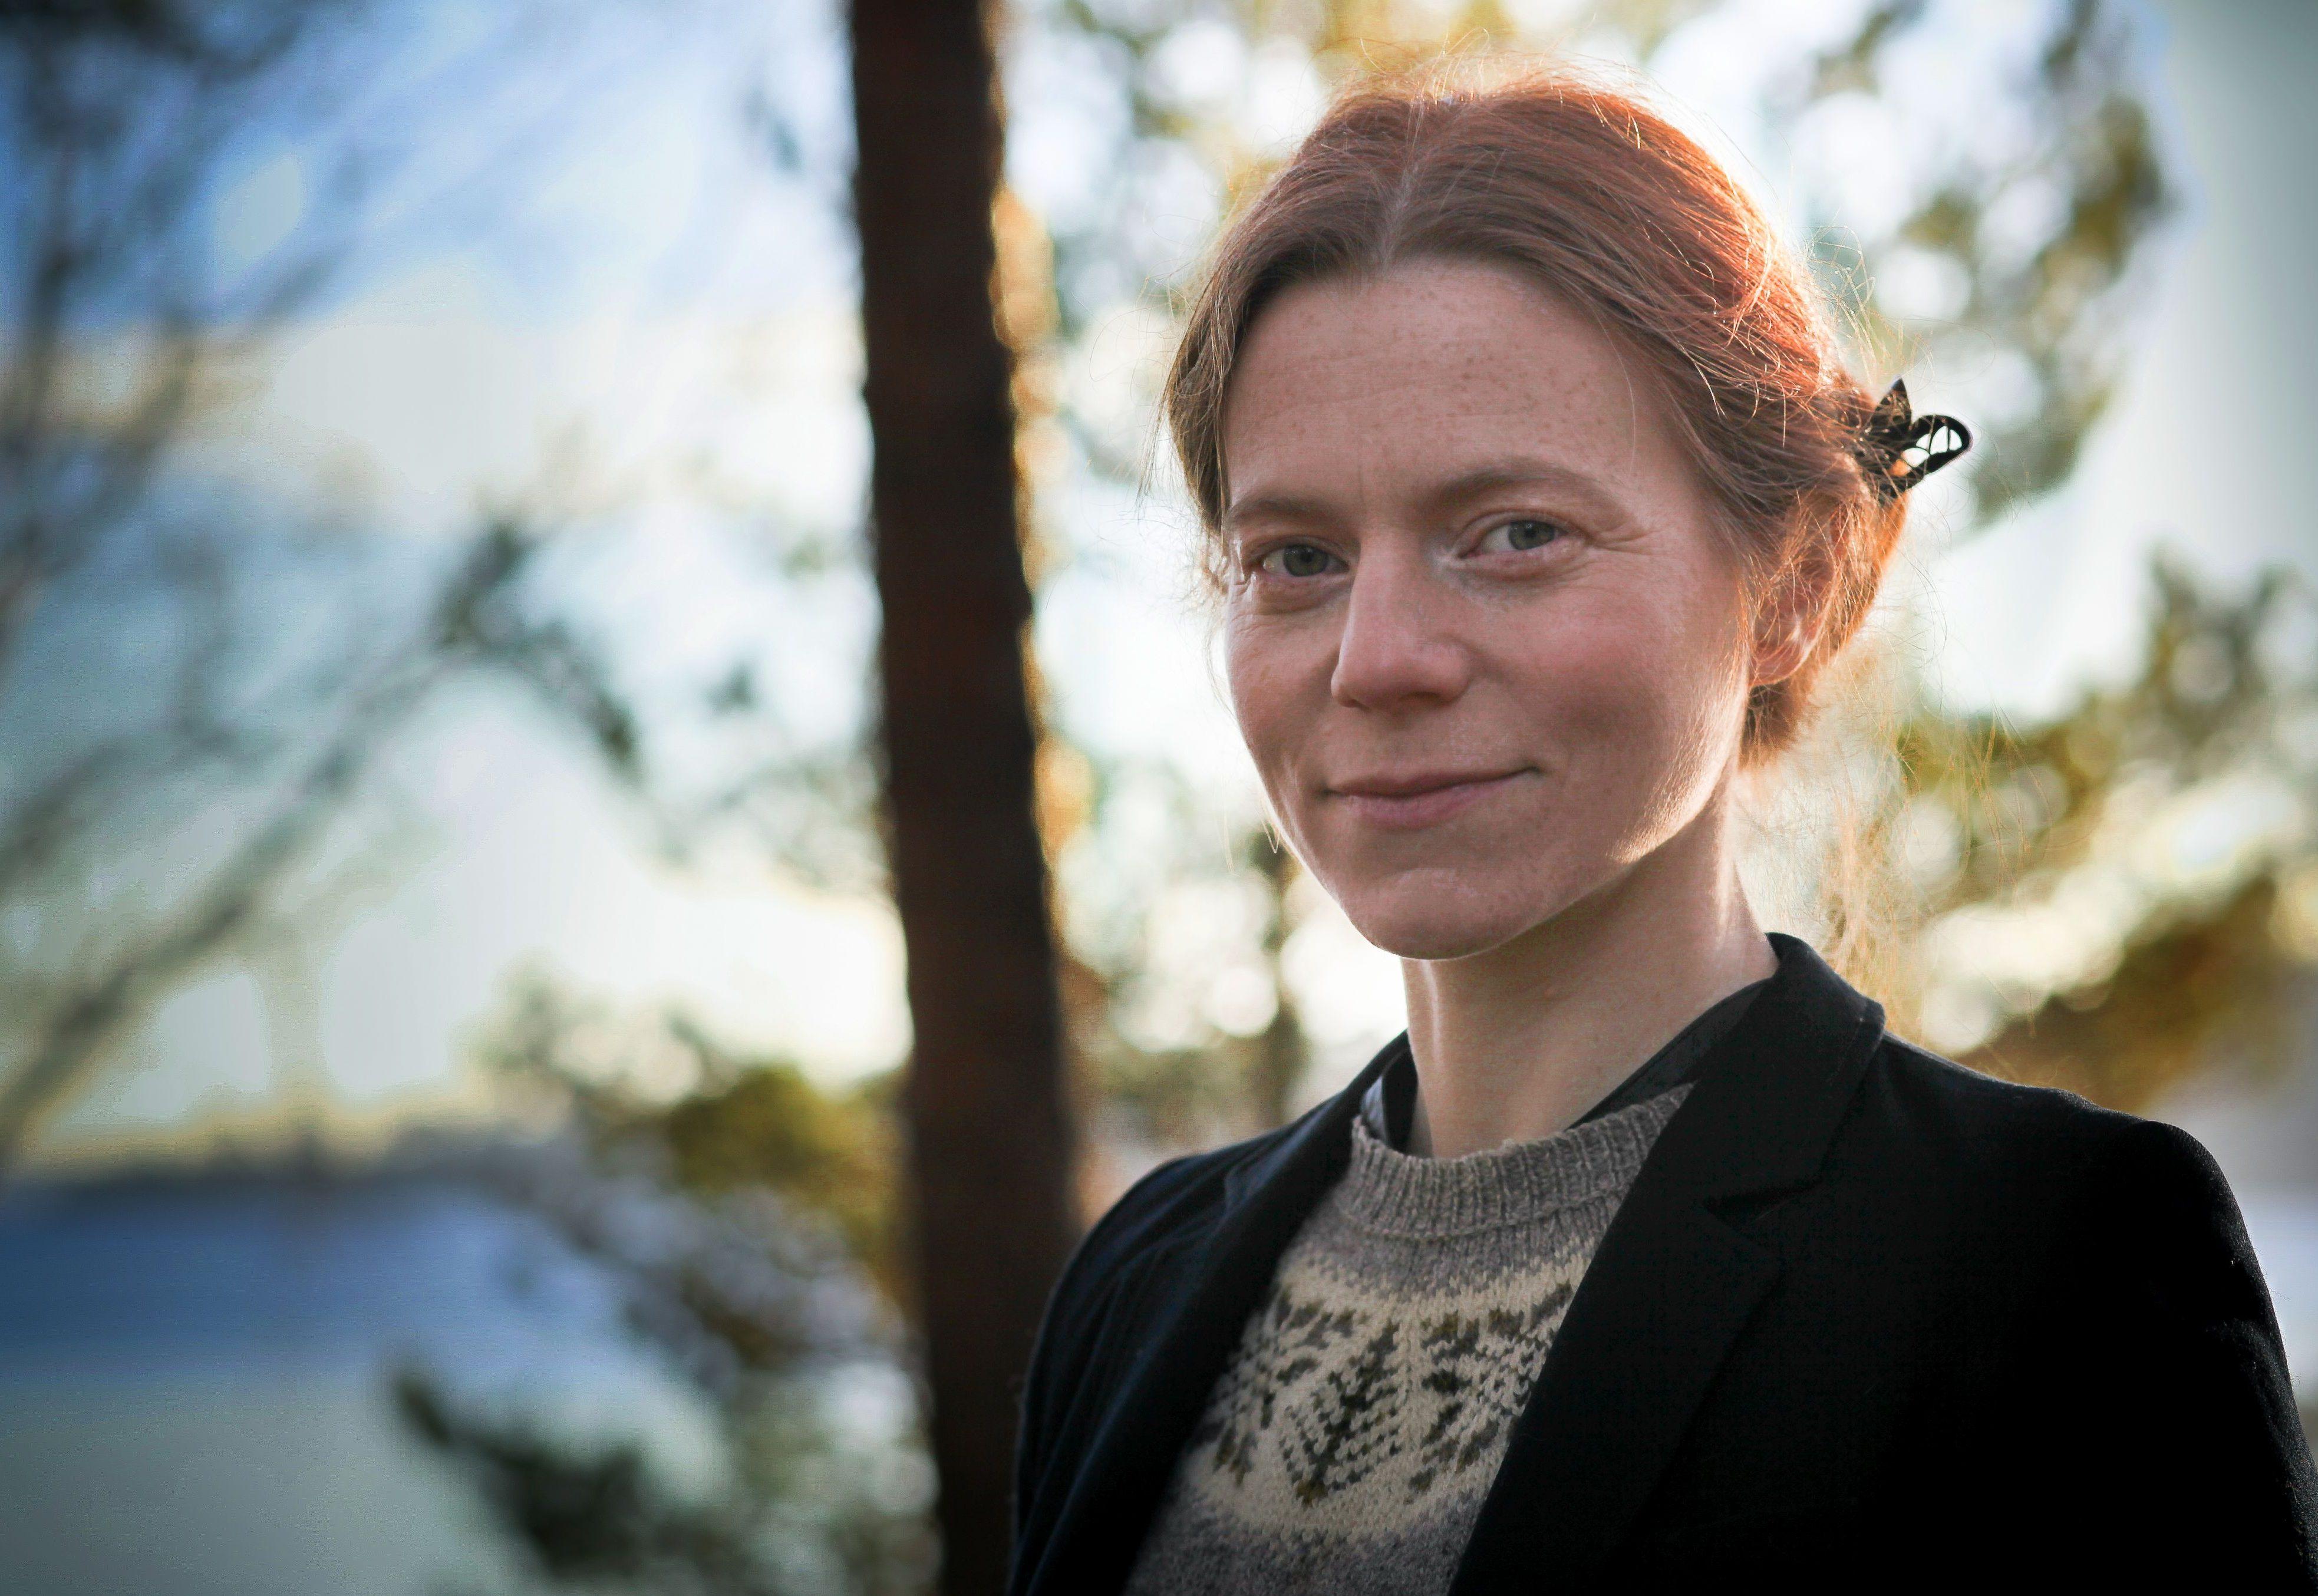 Linnéa Falk started working as the Team Leader of Rewilding Sweden in September 2018.